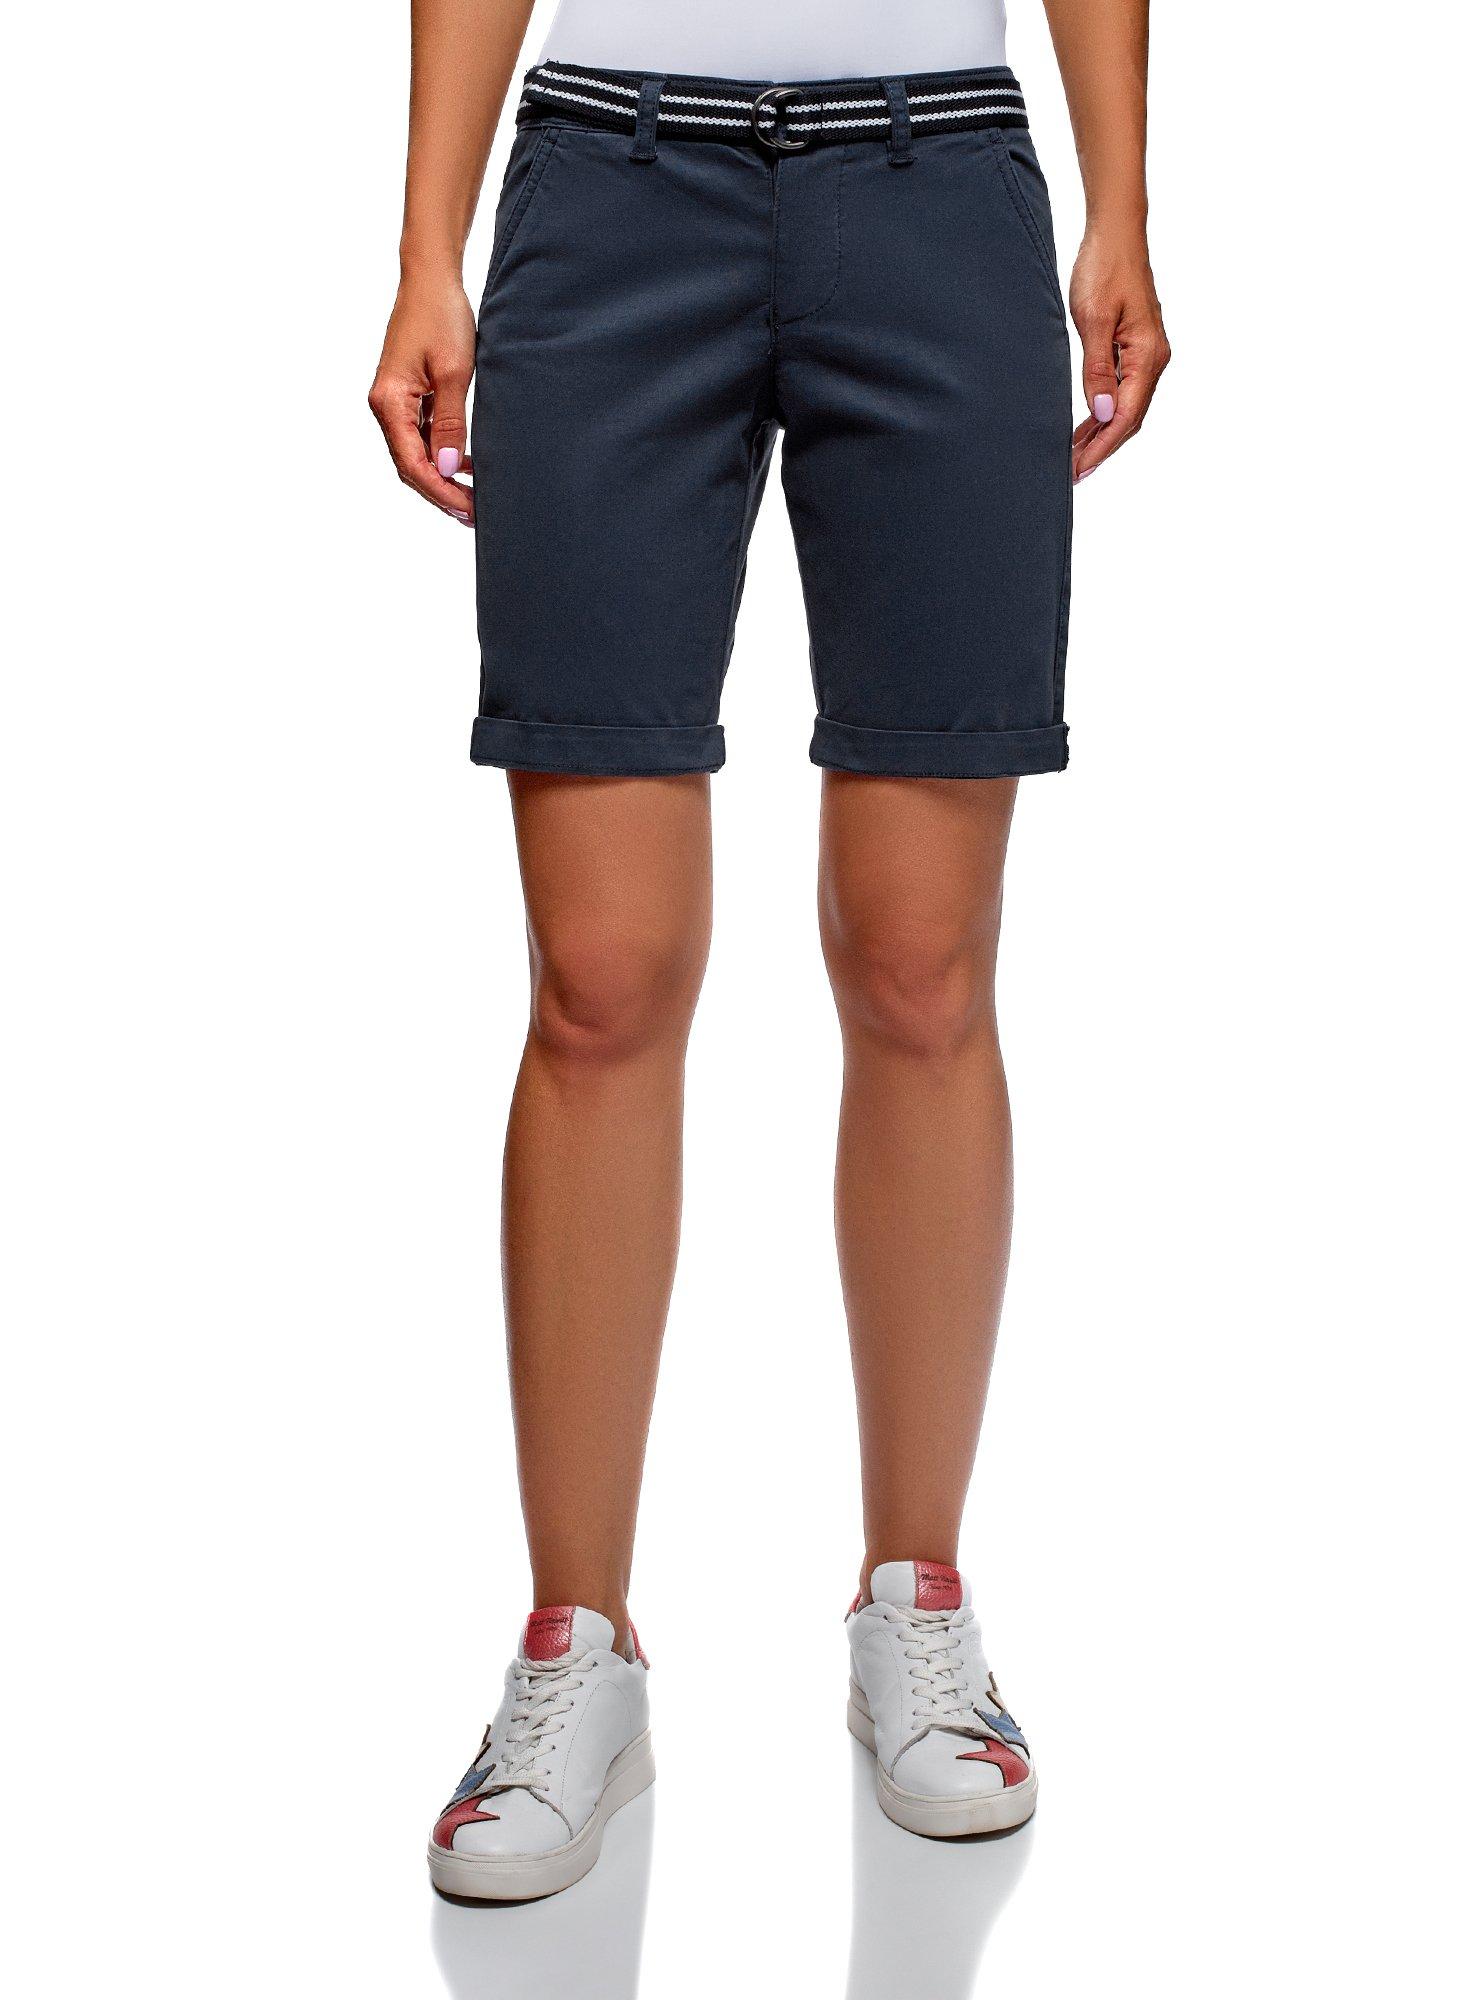 oodji Ultra Women's Belted Cotton Shorts, Blue, 4